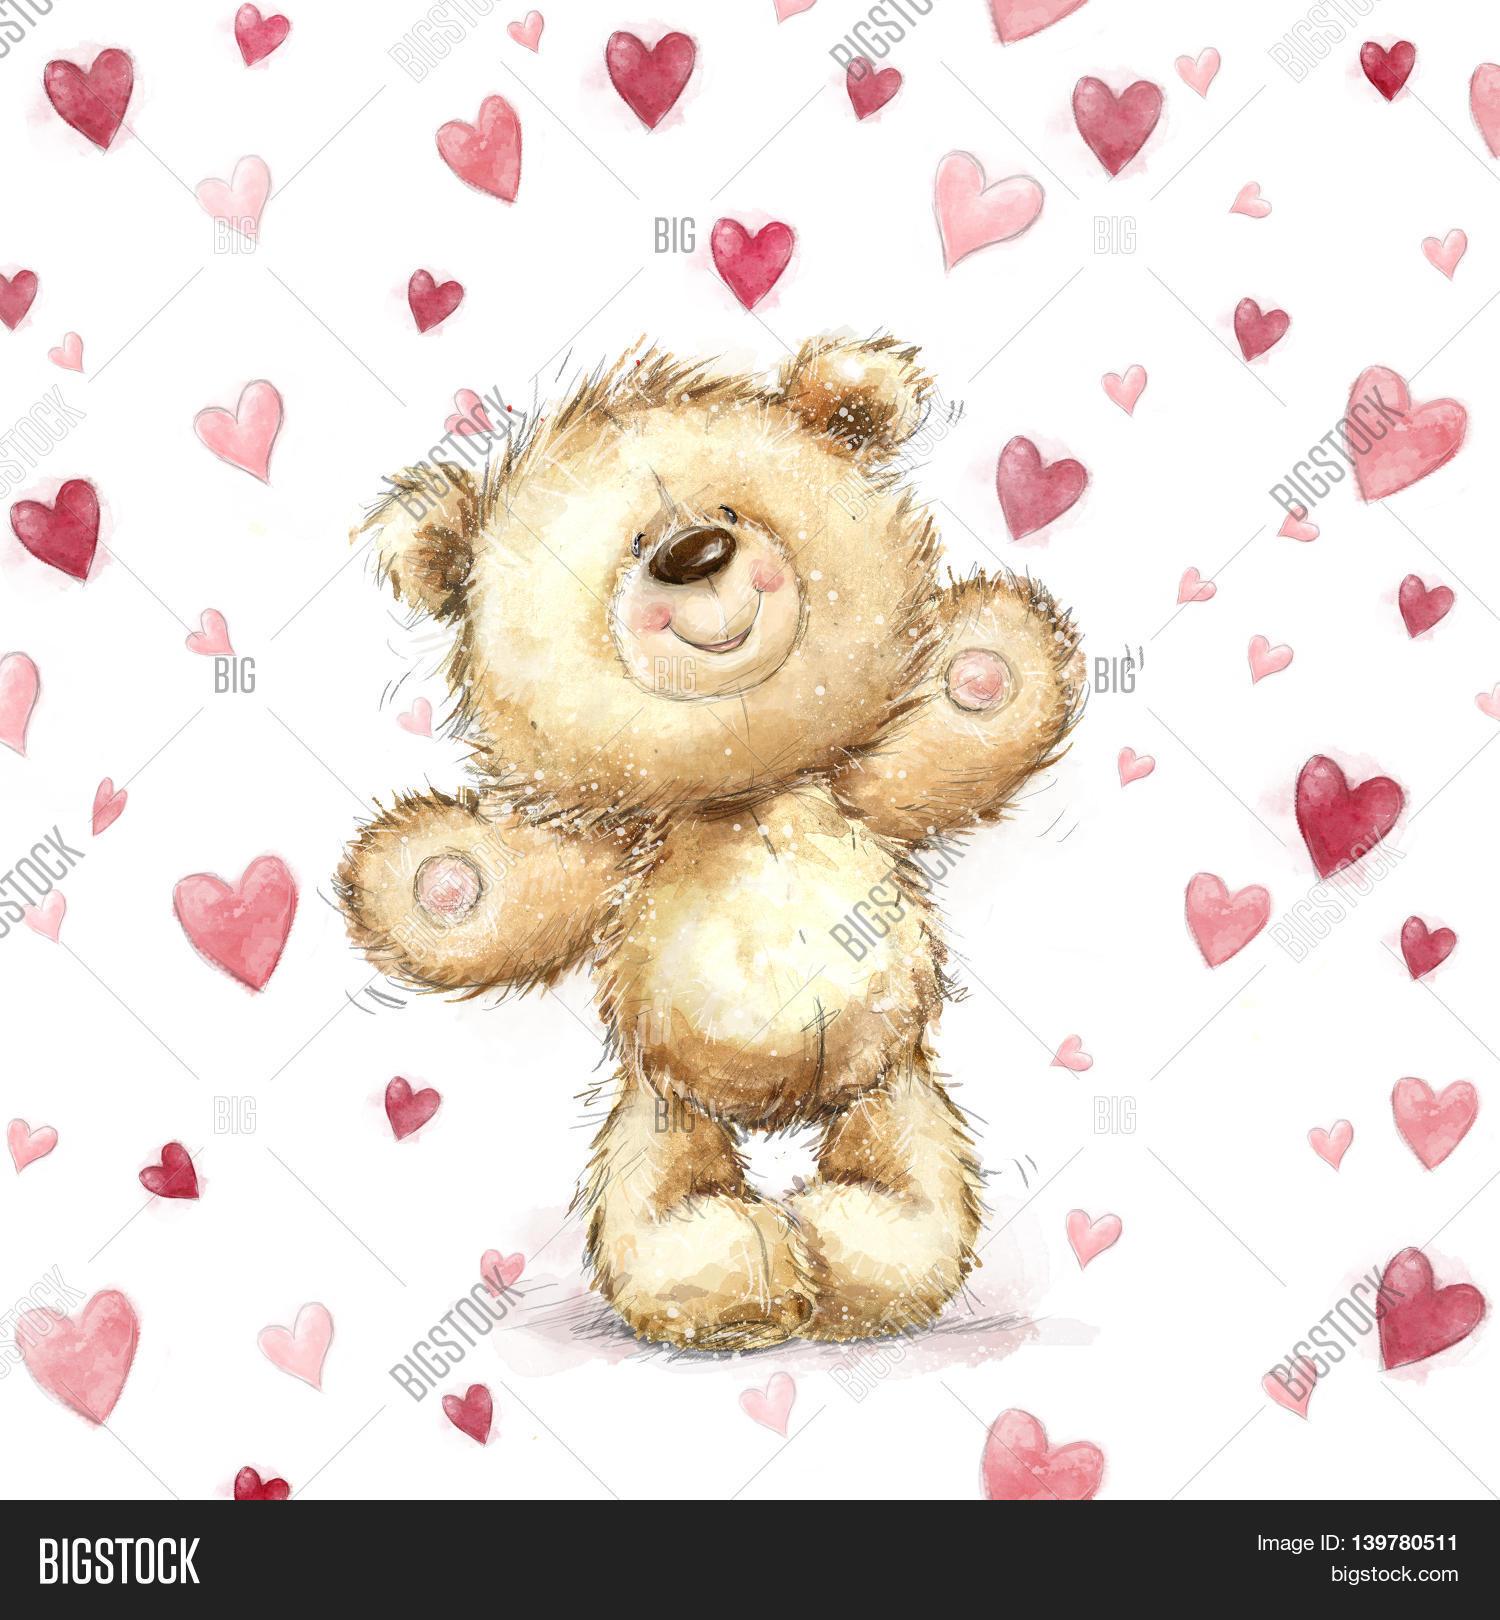 Teddy bear red heartslentines image photo bigstock teddy bear with red heartslentines greeting card love designlovei kristyandbryce Choice Image